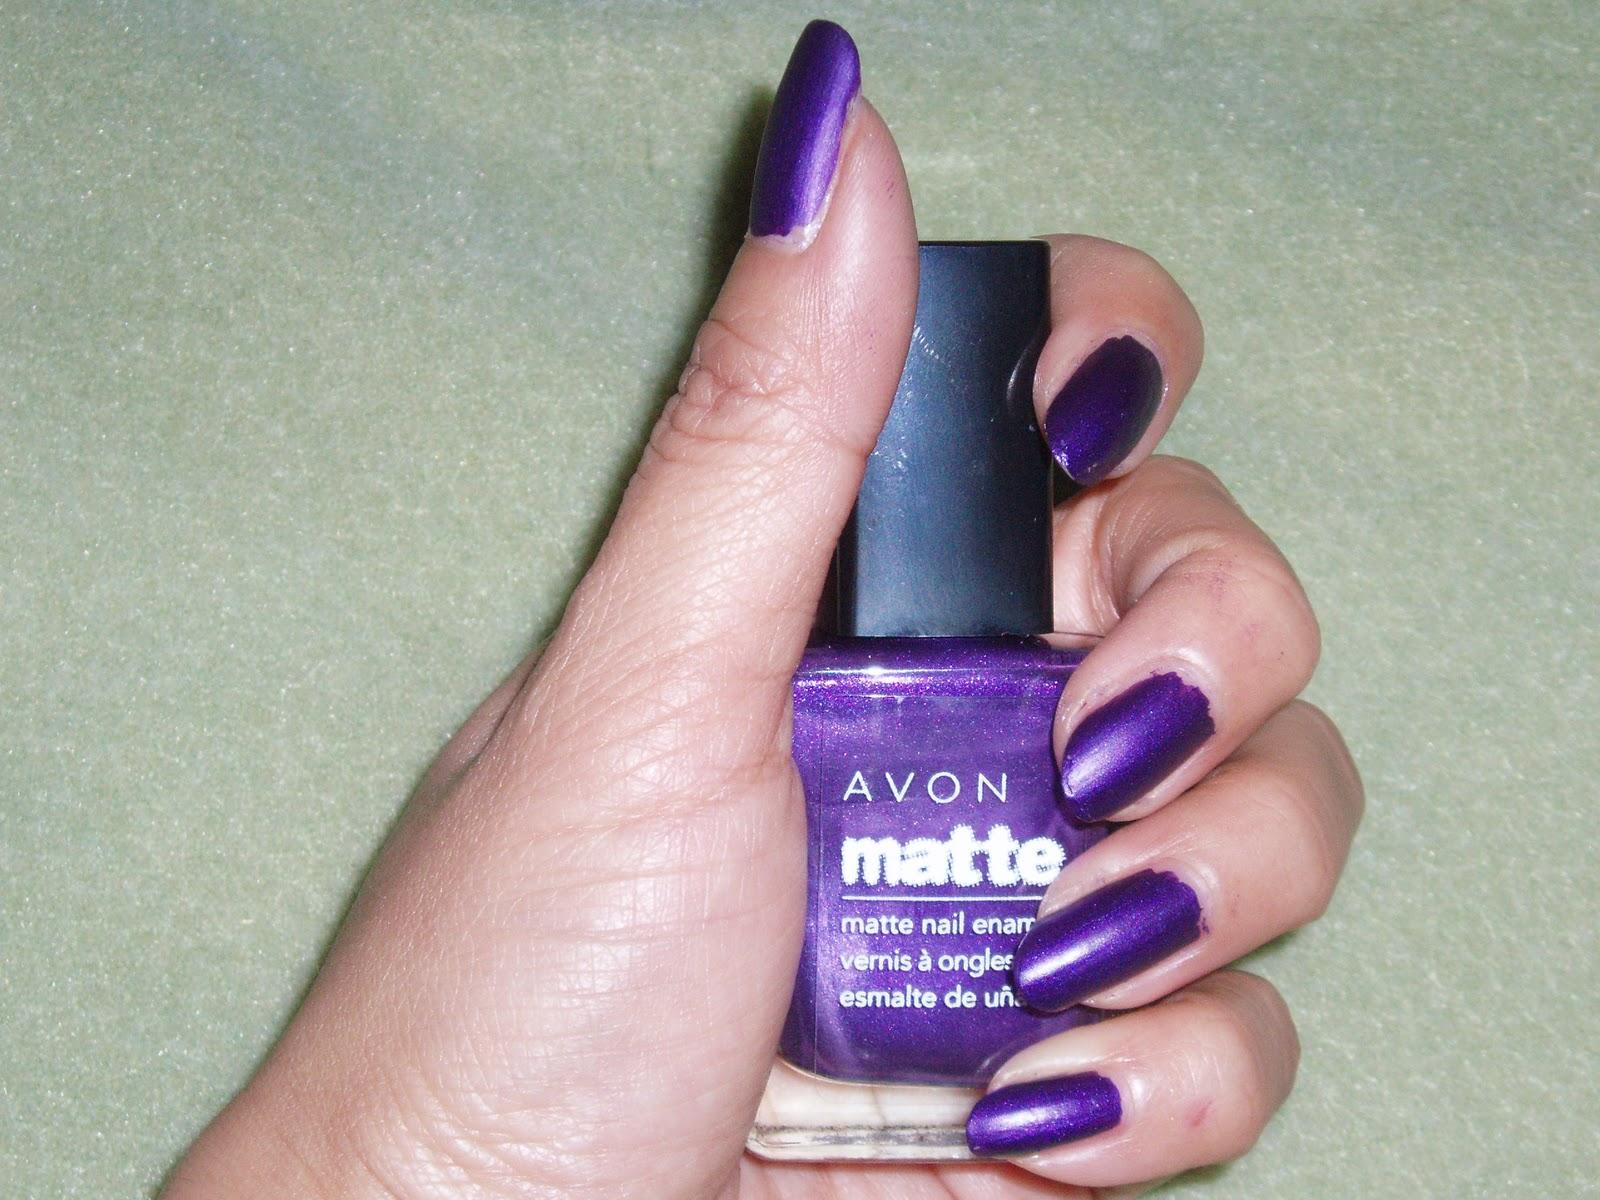 4.bp.blogspot.com__zbqUODWzZvQ_TPXBwf3y52I_AAAAAAAADPs_k0cGPEeXWI0_s1600_P1010391+-+Avon+Violetta